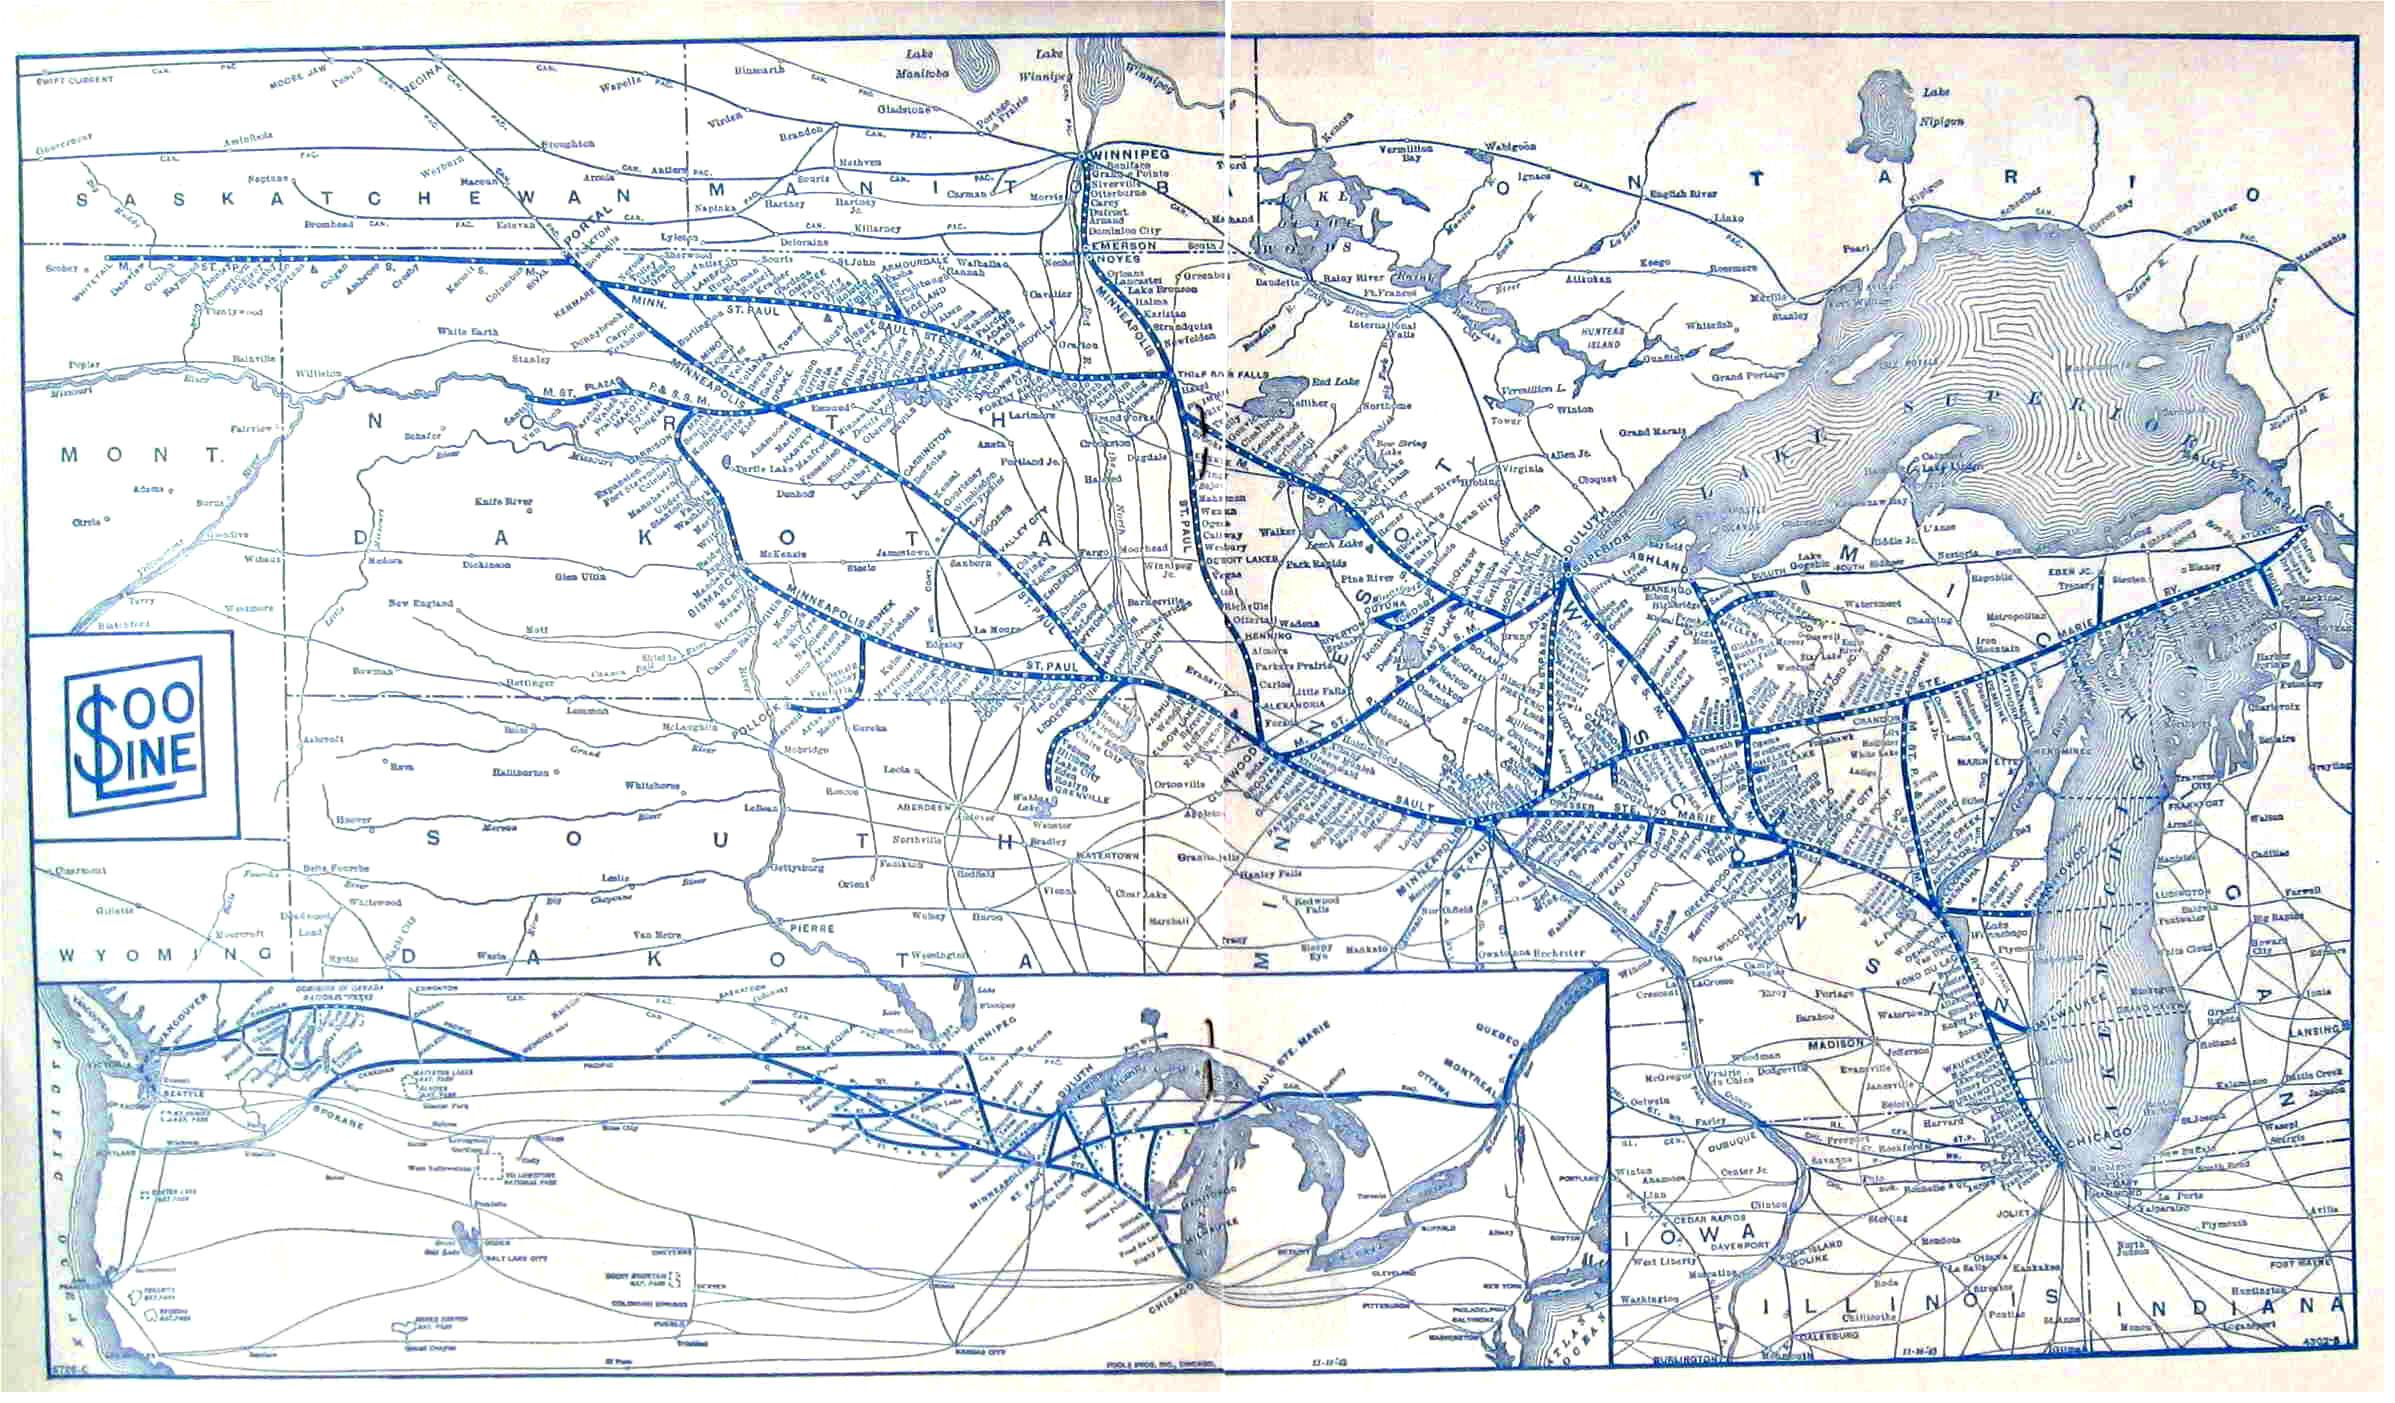 Transportation Company - SOO Line - Railroad